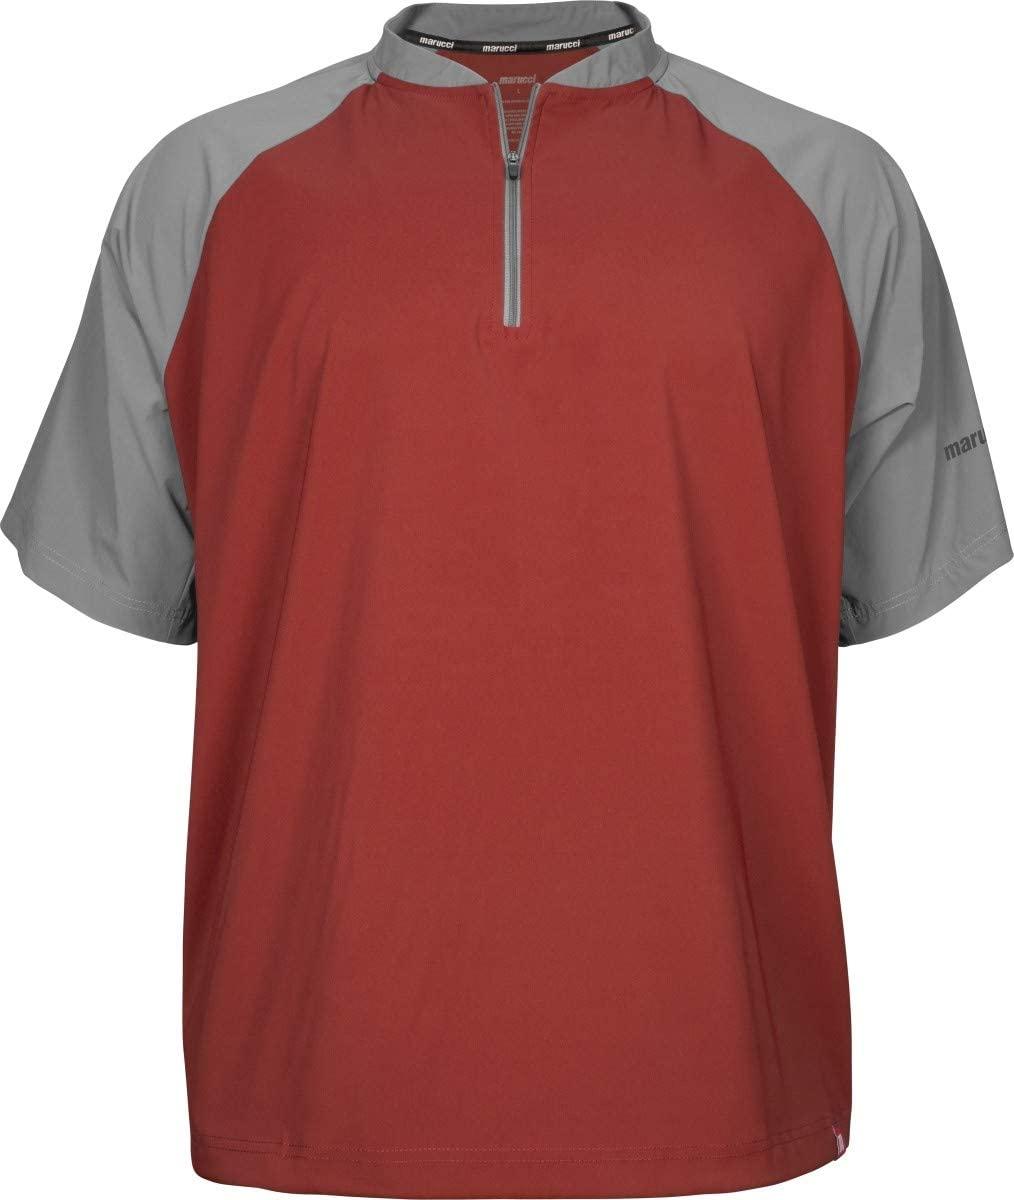 marucci-team-cage-jacket-red-matcgj-r-axl-baseball-outerwear MATCGJ-R-XL Marucci